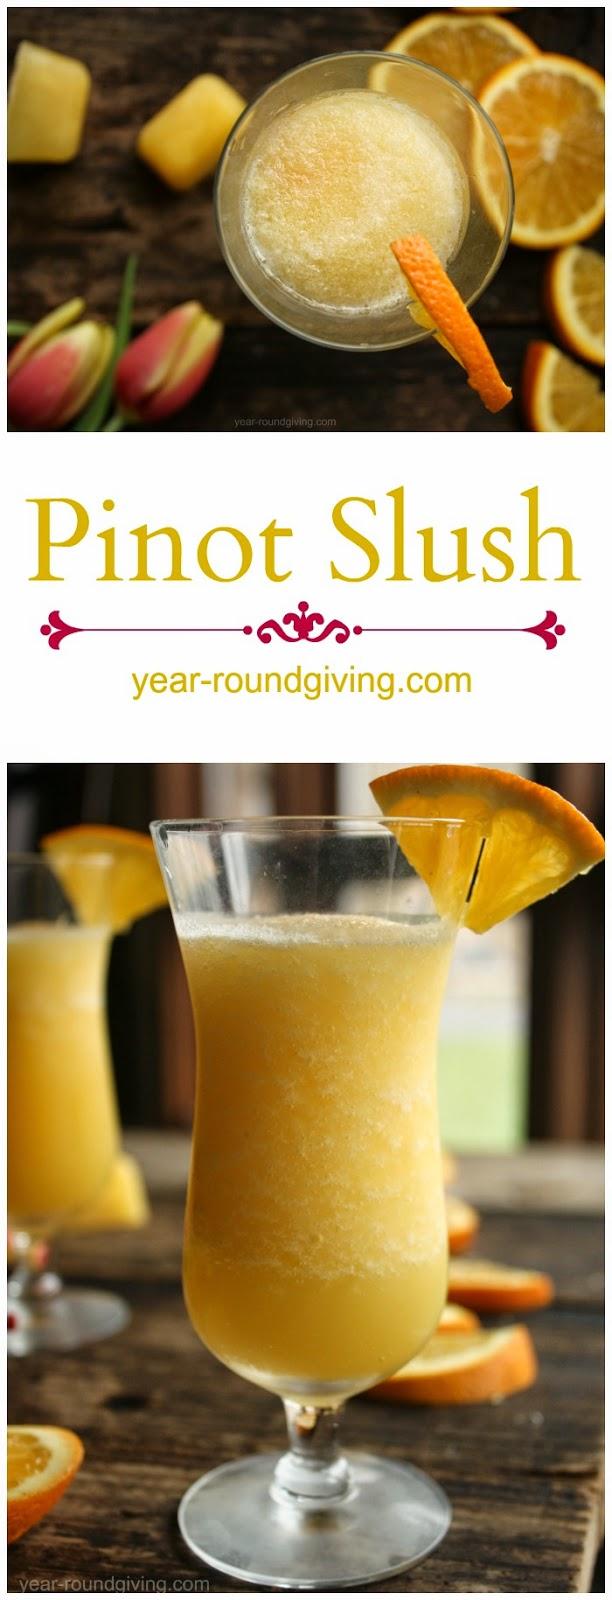 Pinot Slush Cocktail